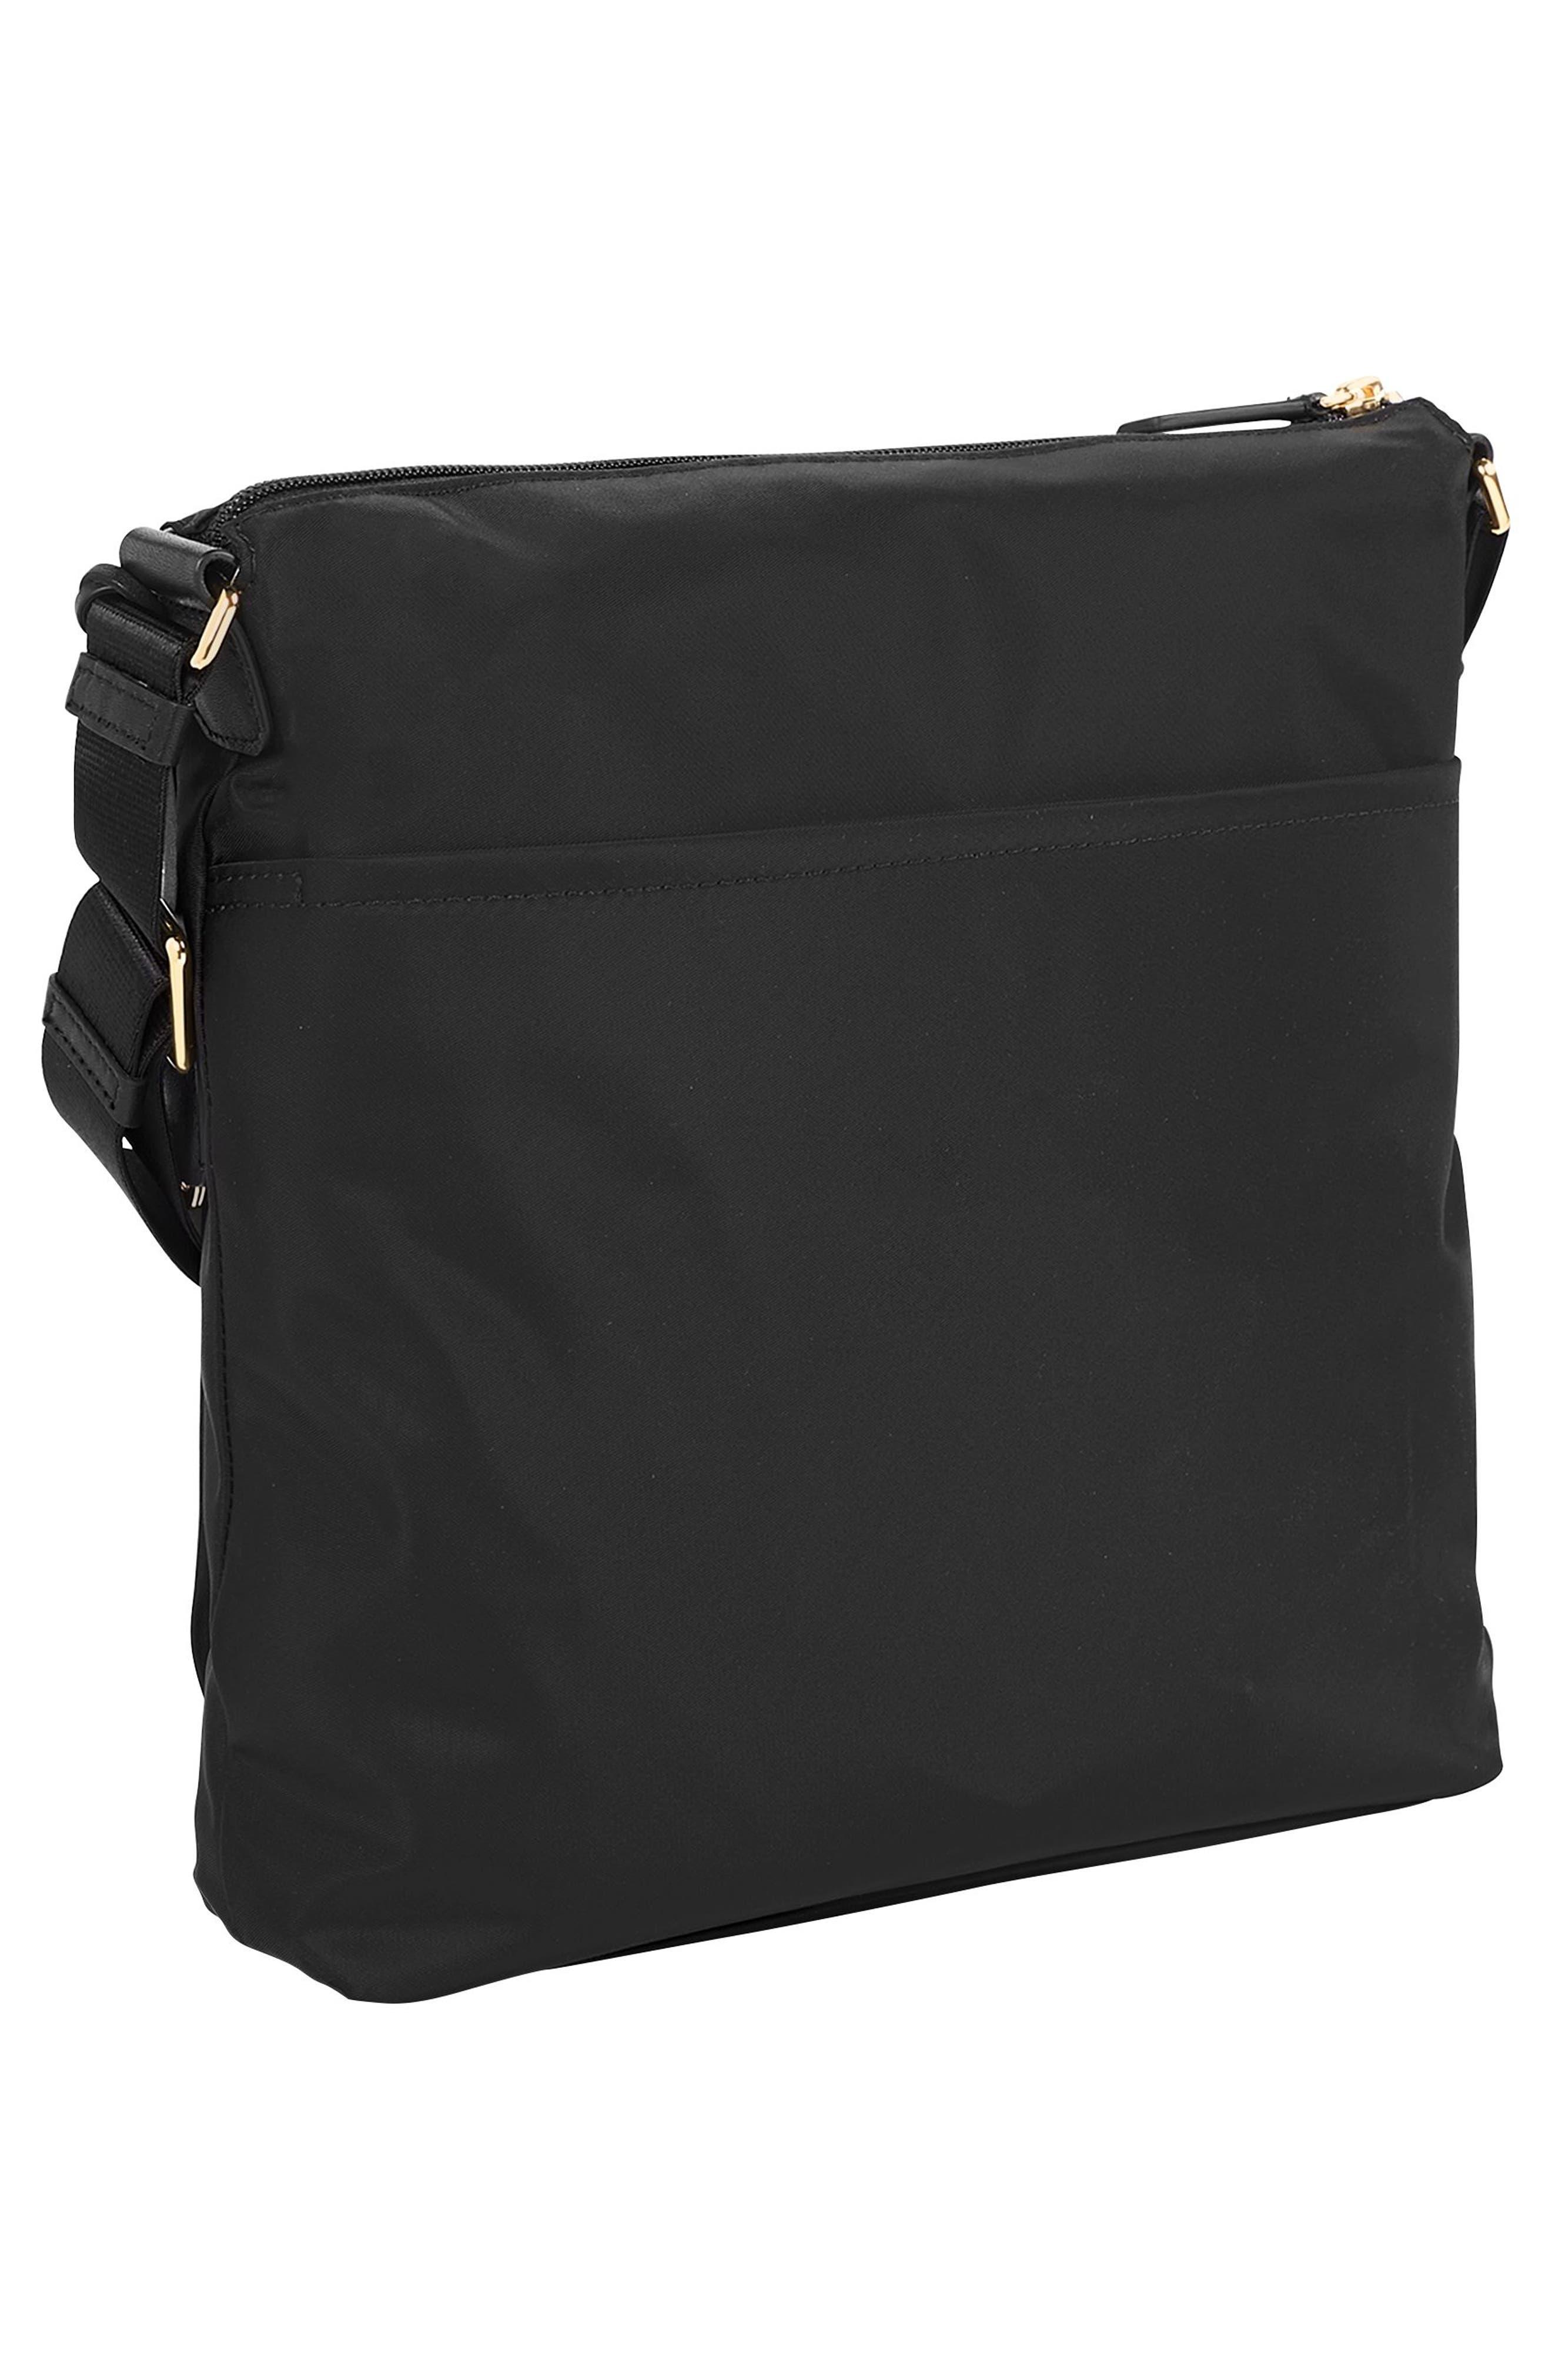 Voyageur - Canton Nylon Crossbody Bag,                             Alternate thumbnail 3, color,                             BLACK